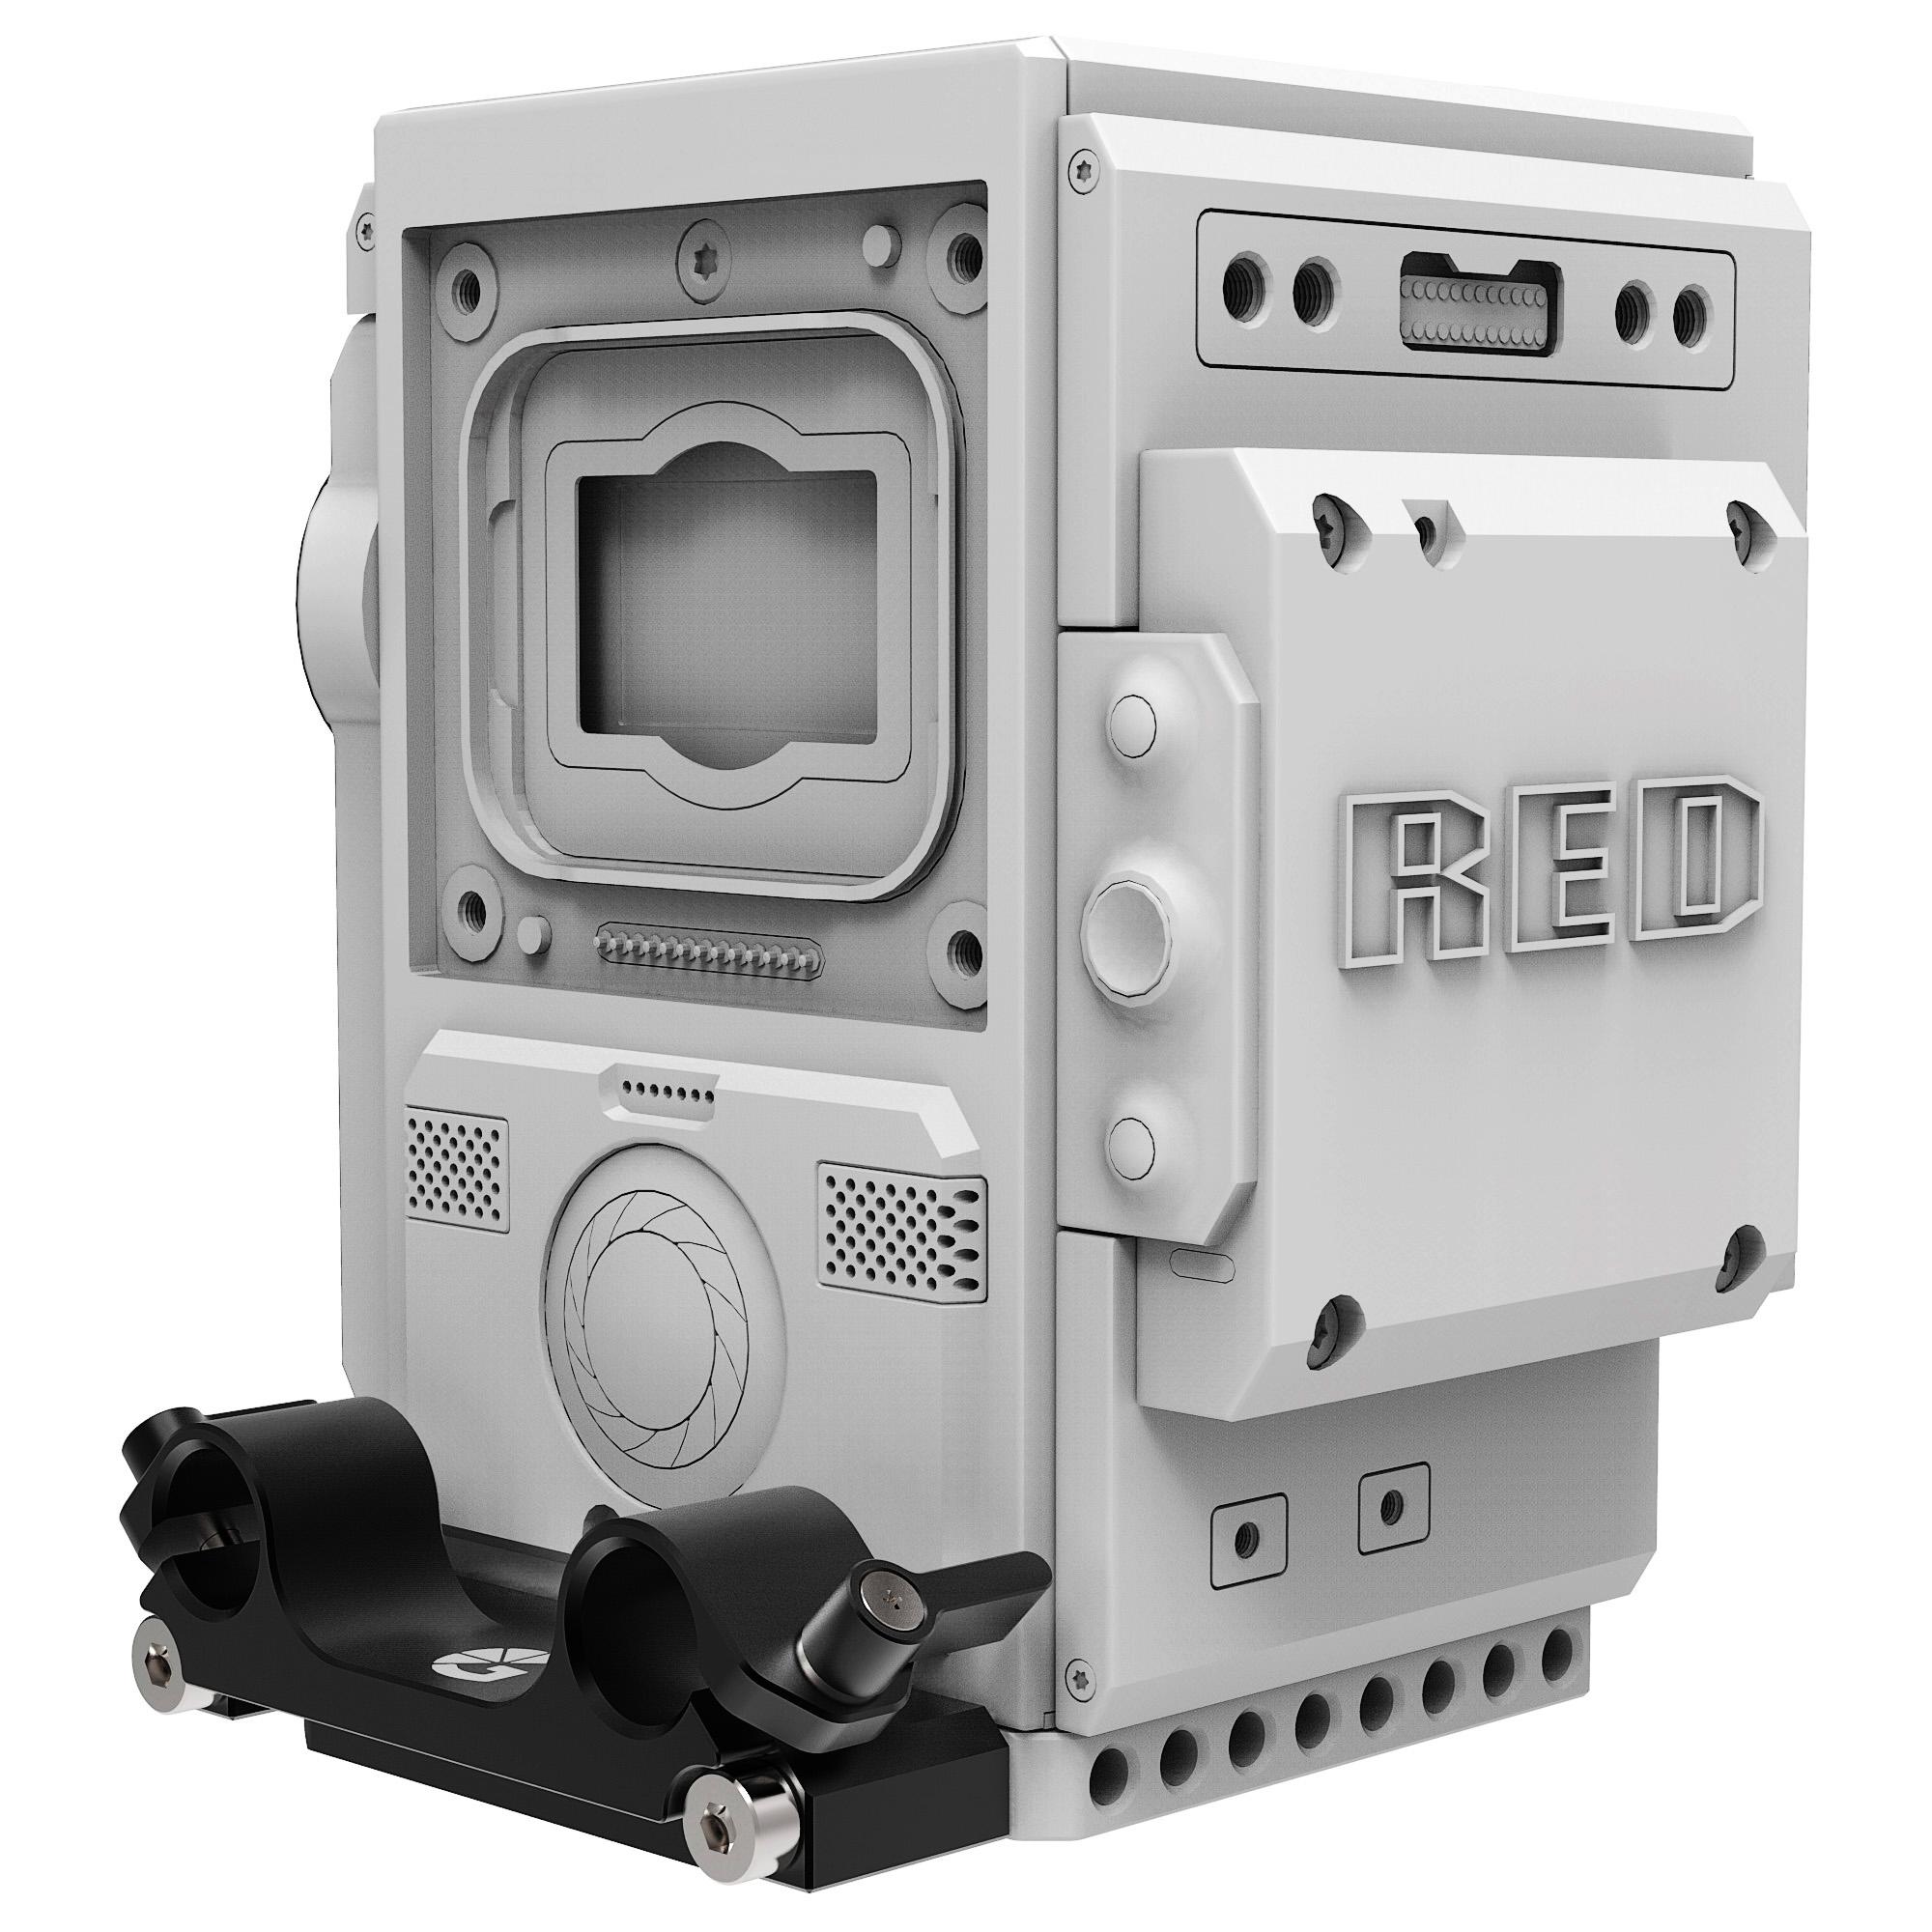 B4002 1003 15mm LWS mount for DSMC2 3 1